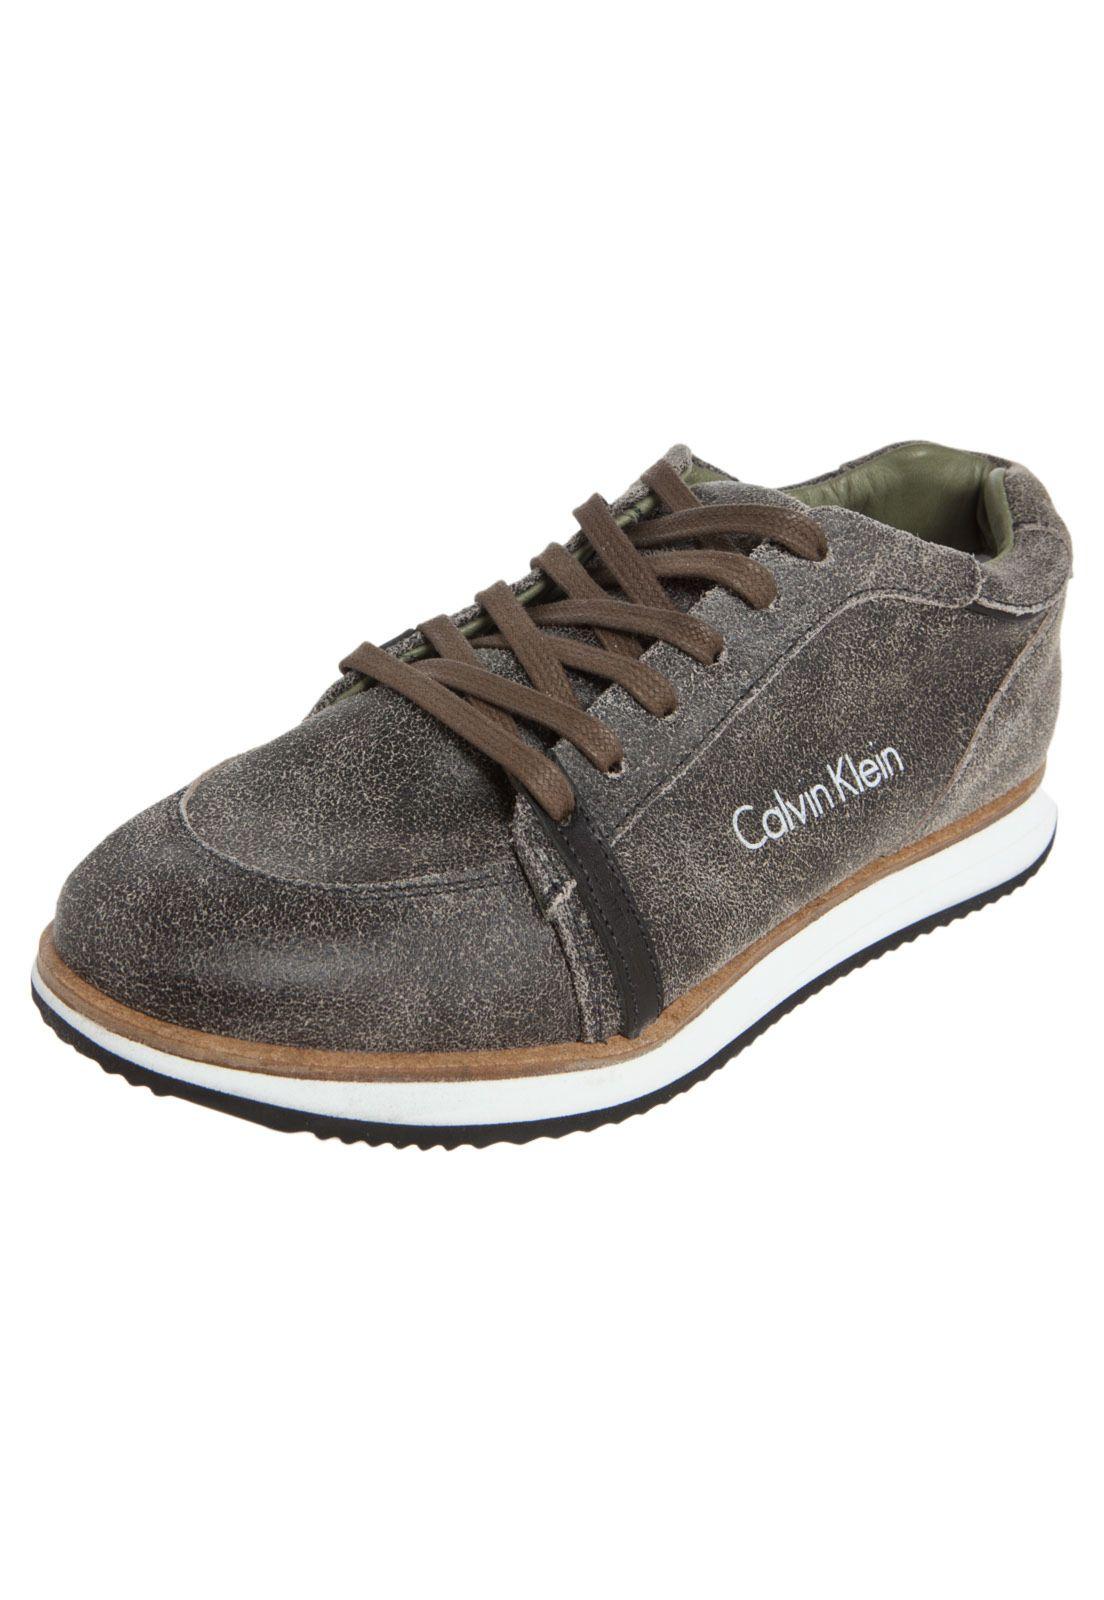 45a927c4de Tênis Calvin Klein Huen Marrom